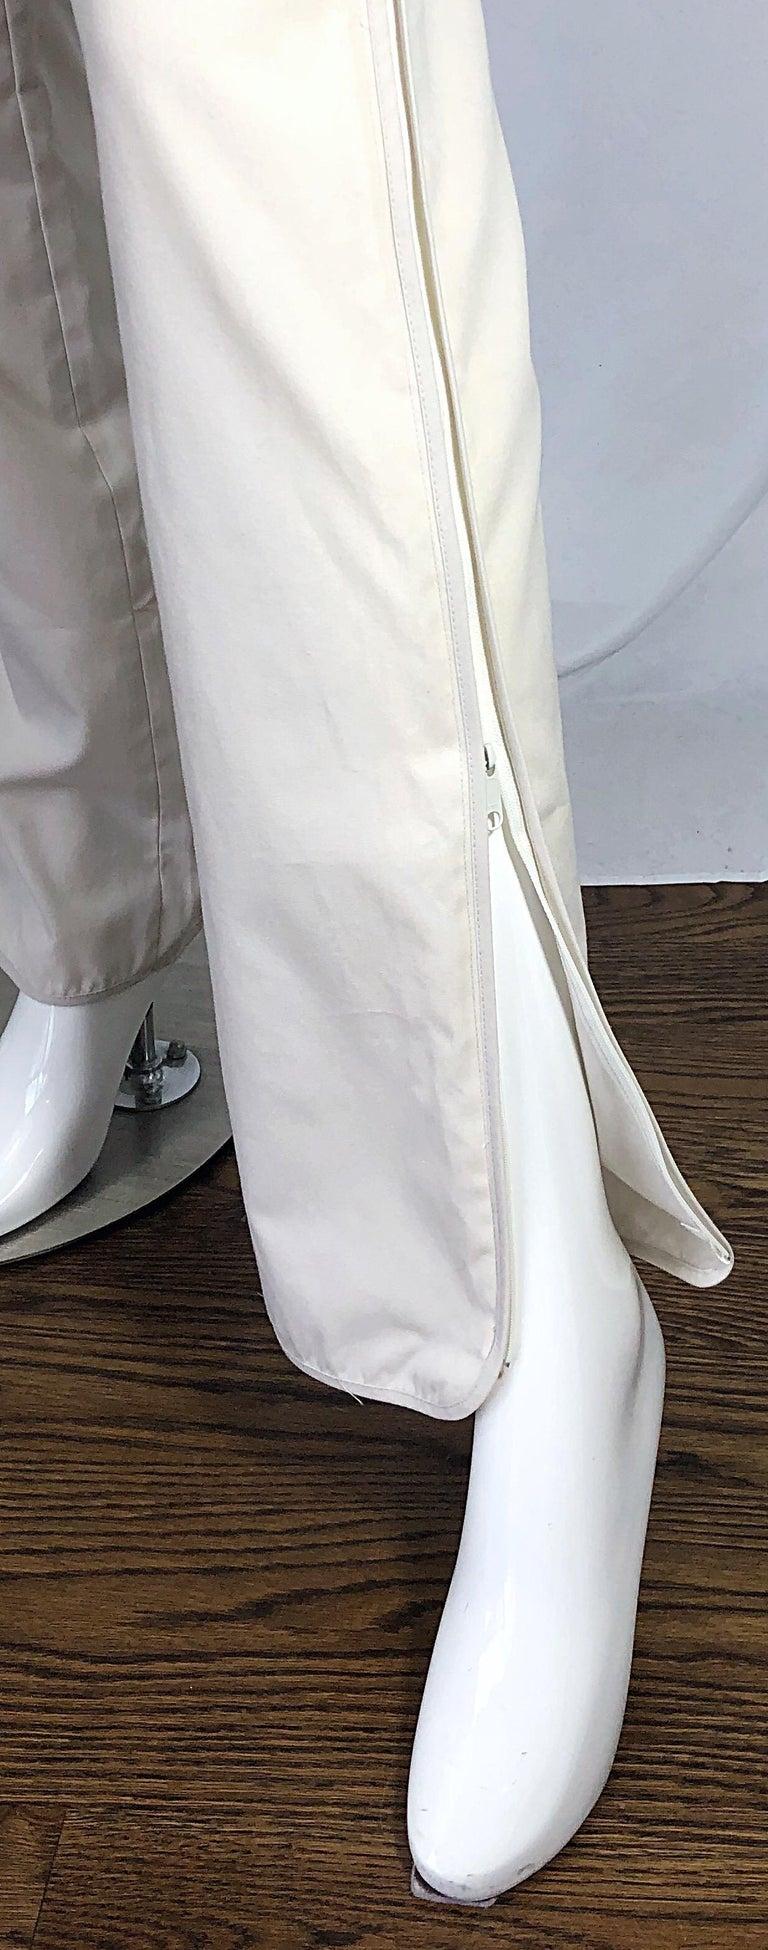 Women's 1990s Katayone Adeli Size 6 Zipper Leg Low Rise Stone Khaki Trousers Pants  For Sale